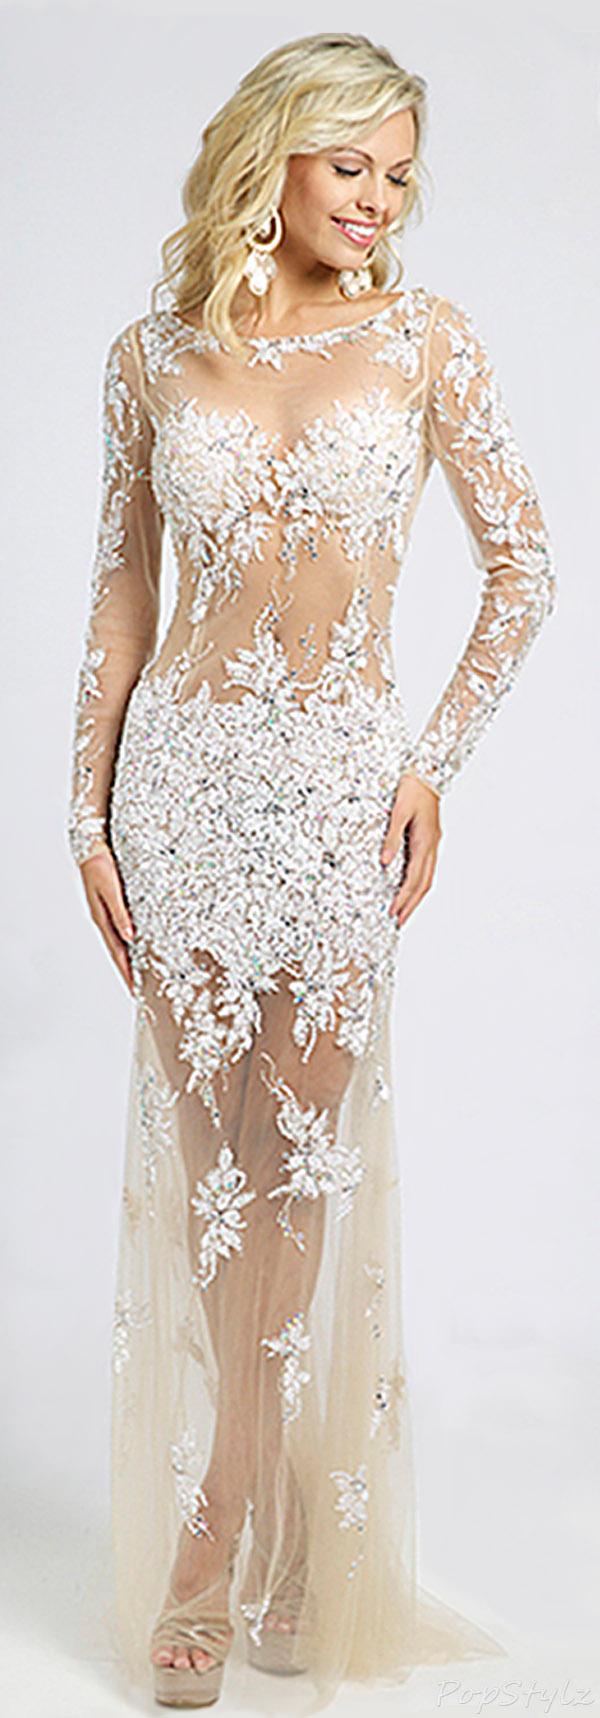 Jovani  89256 Lacy & Sheer 2015 Elegant Gown